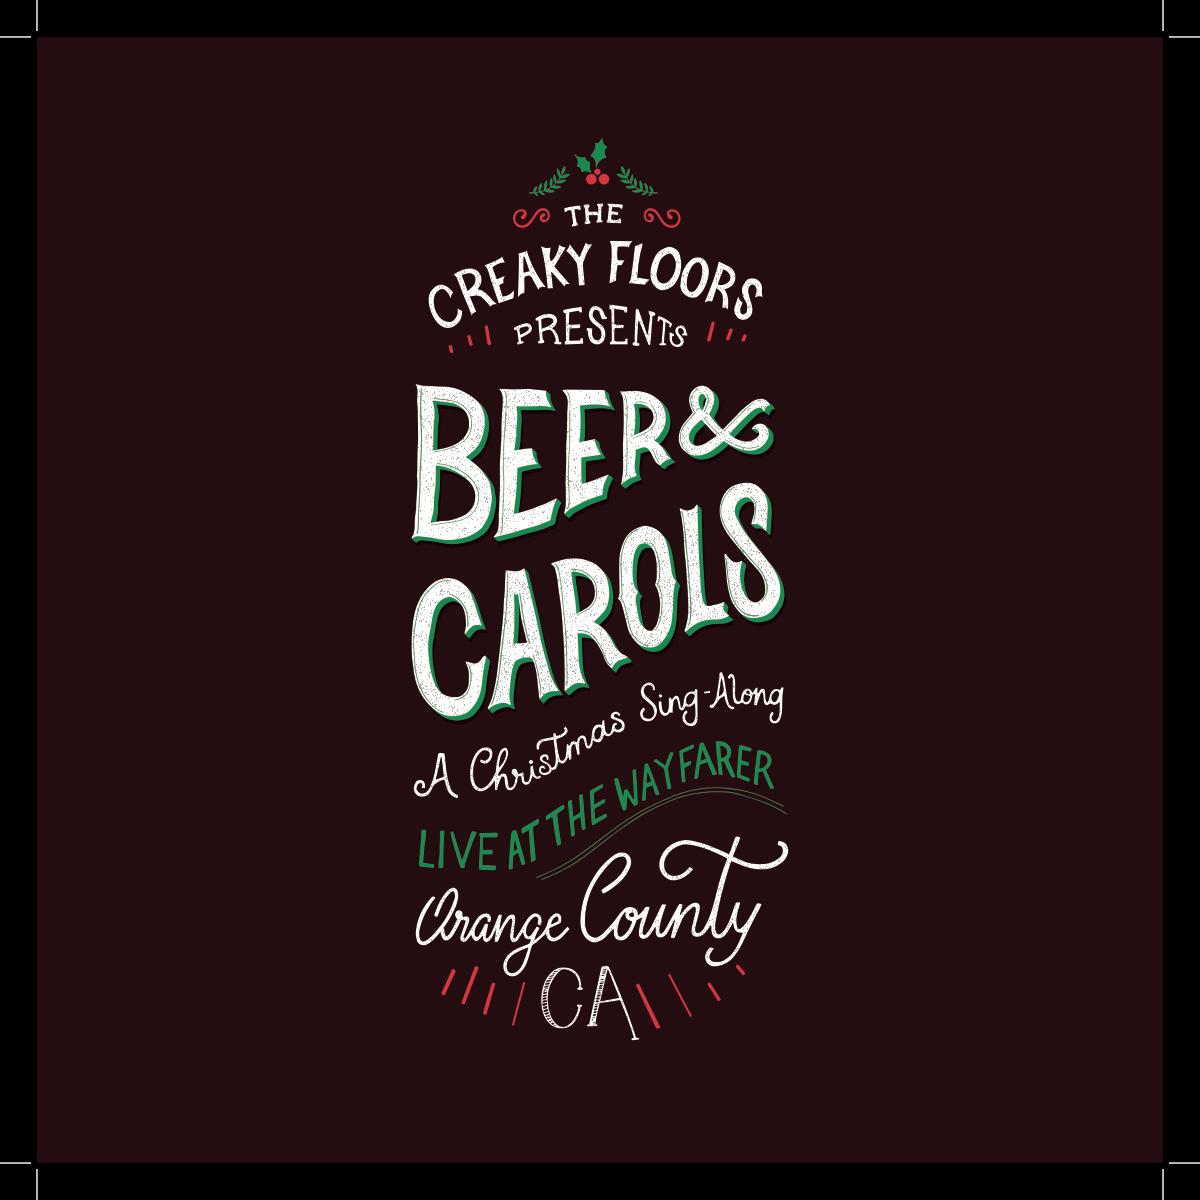 Beer and Hymns Christmas Album